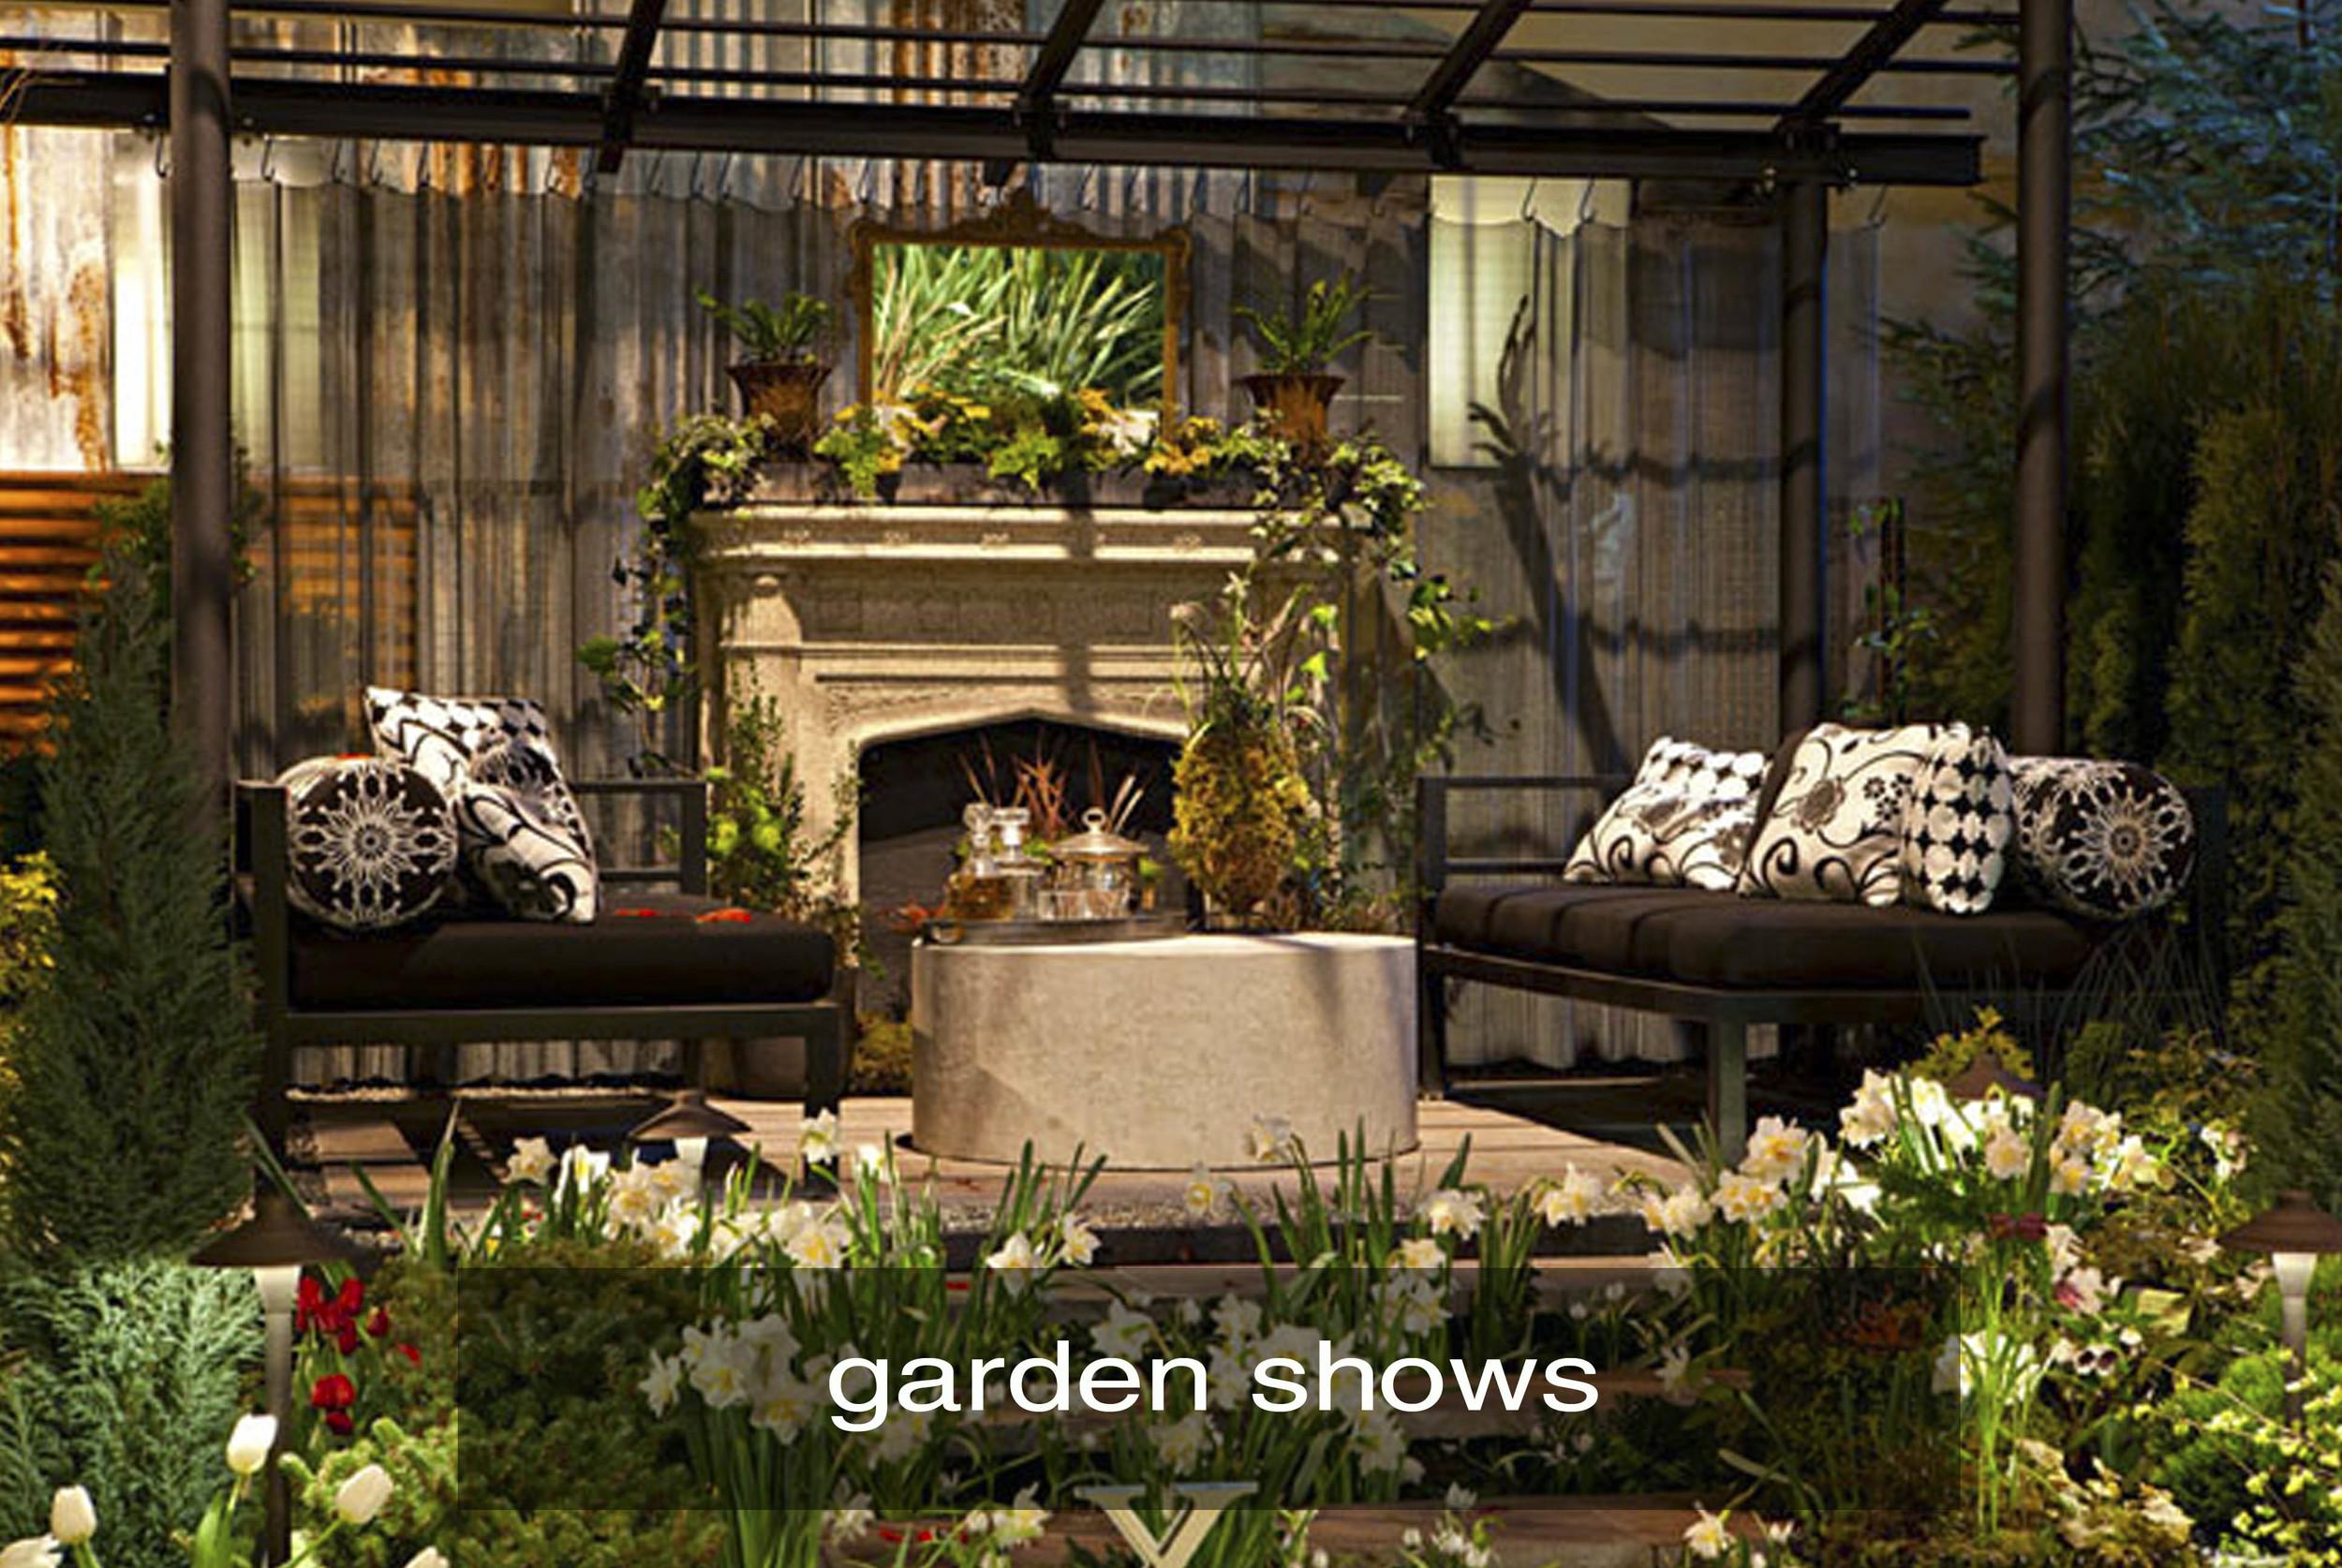 garden_shows_3.jpg